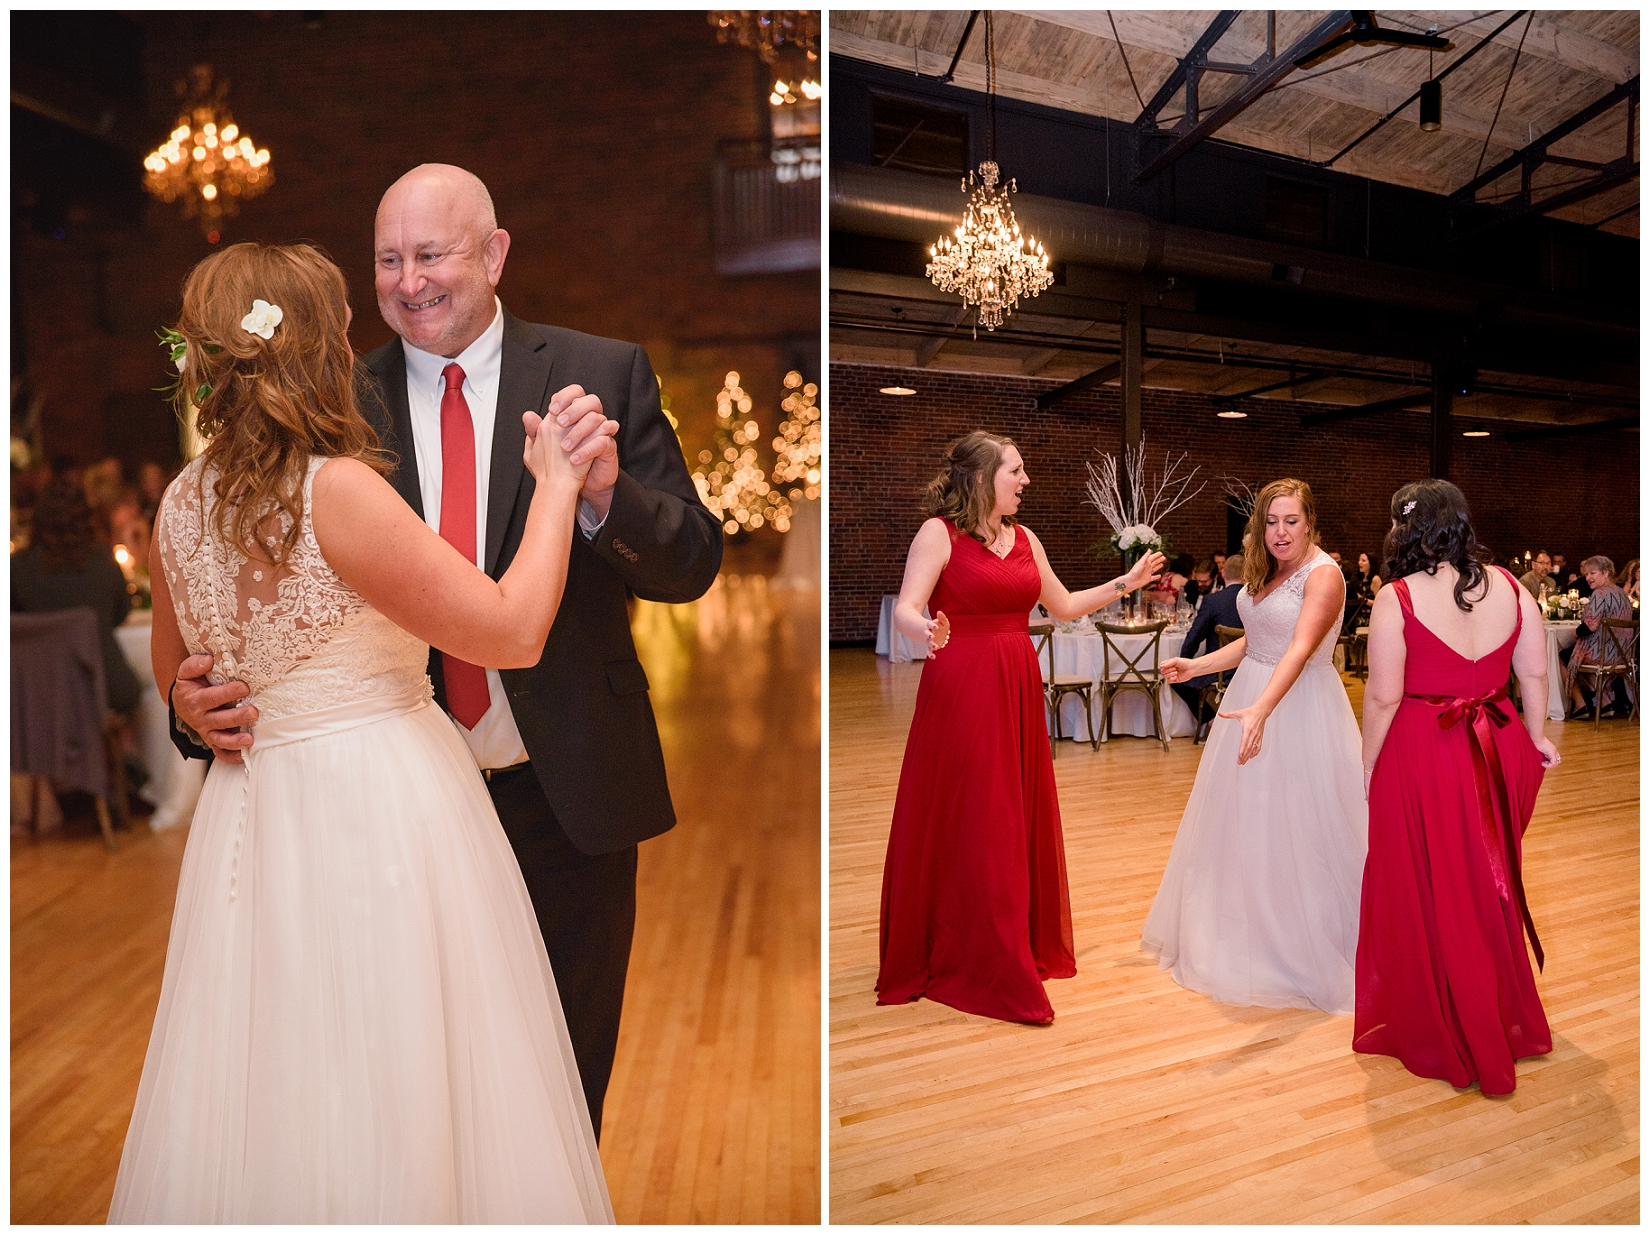 cat-alkire-wedding-photographer-indiana-chicago-indianapolis-fort-wayne_1006.jpg